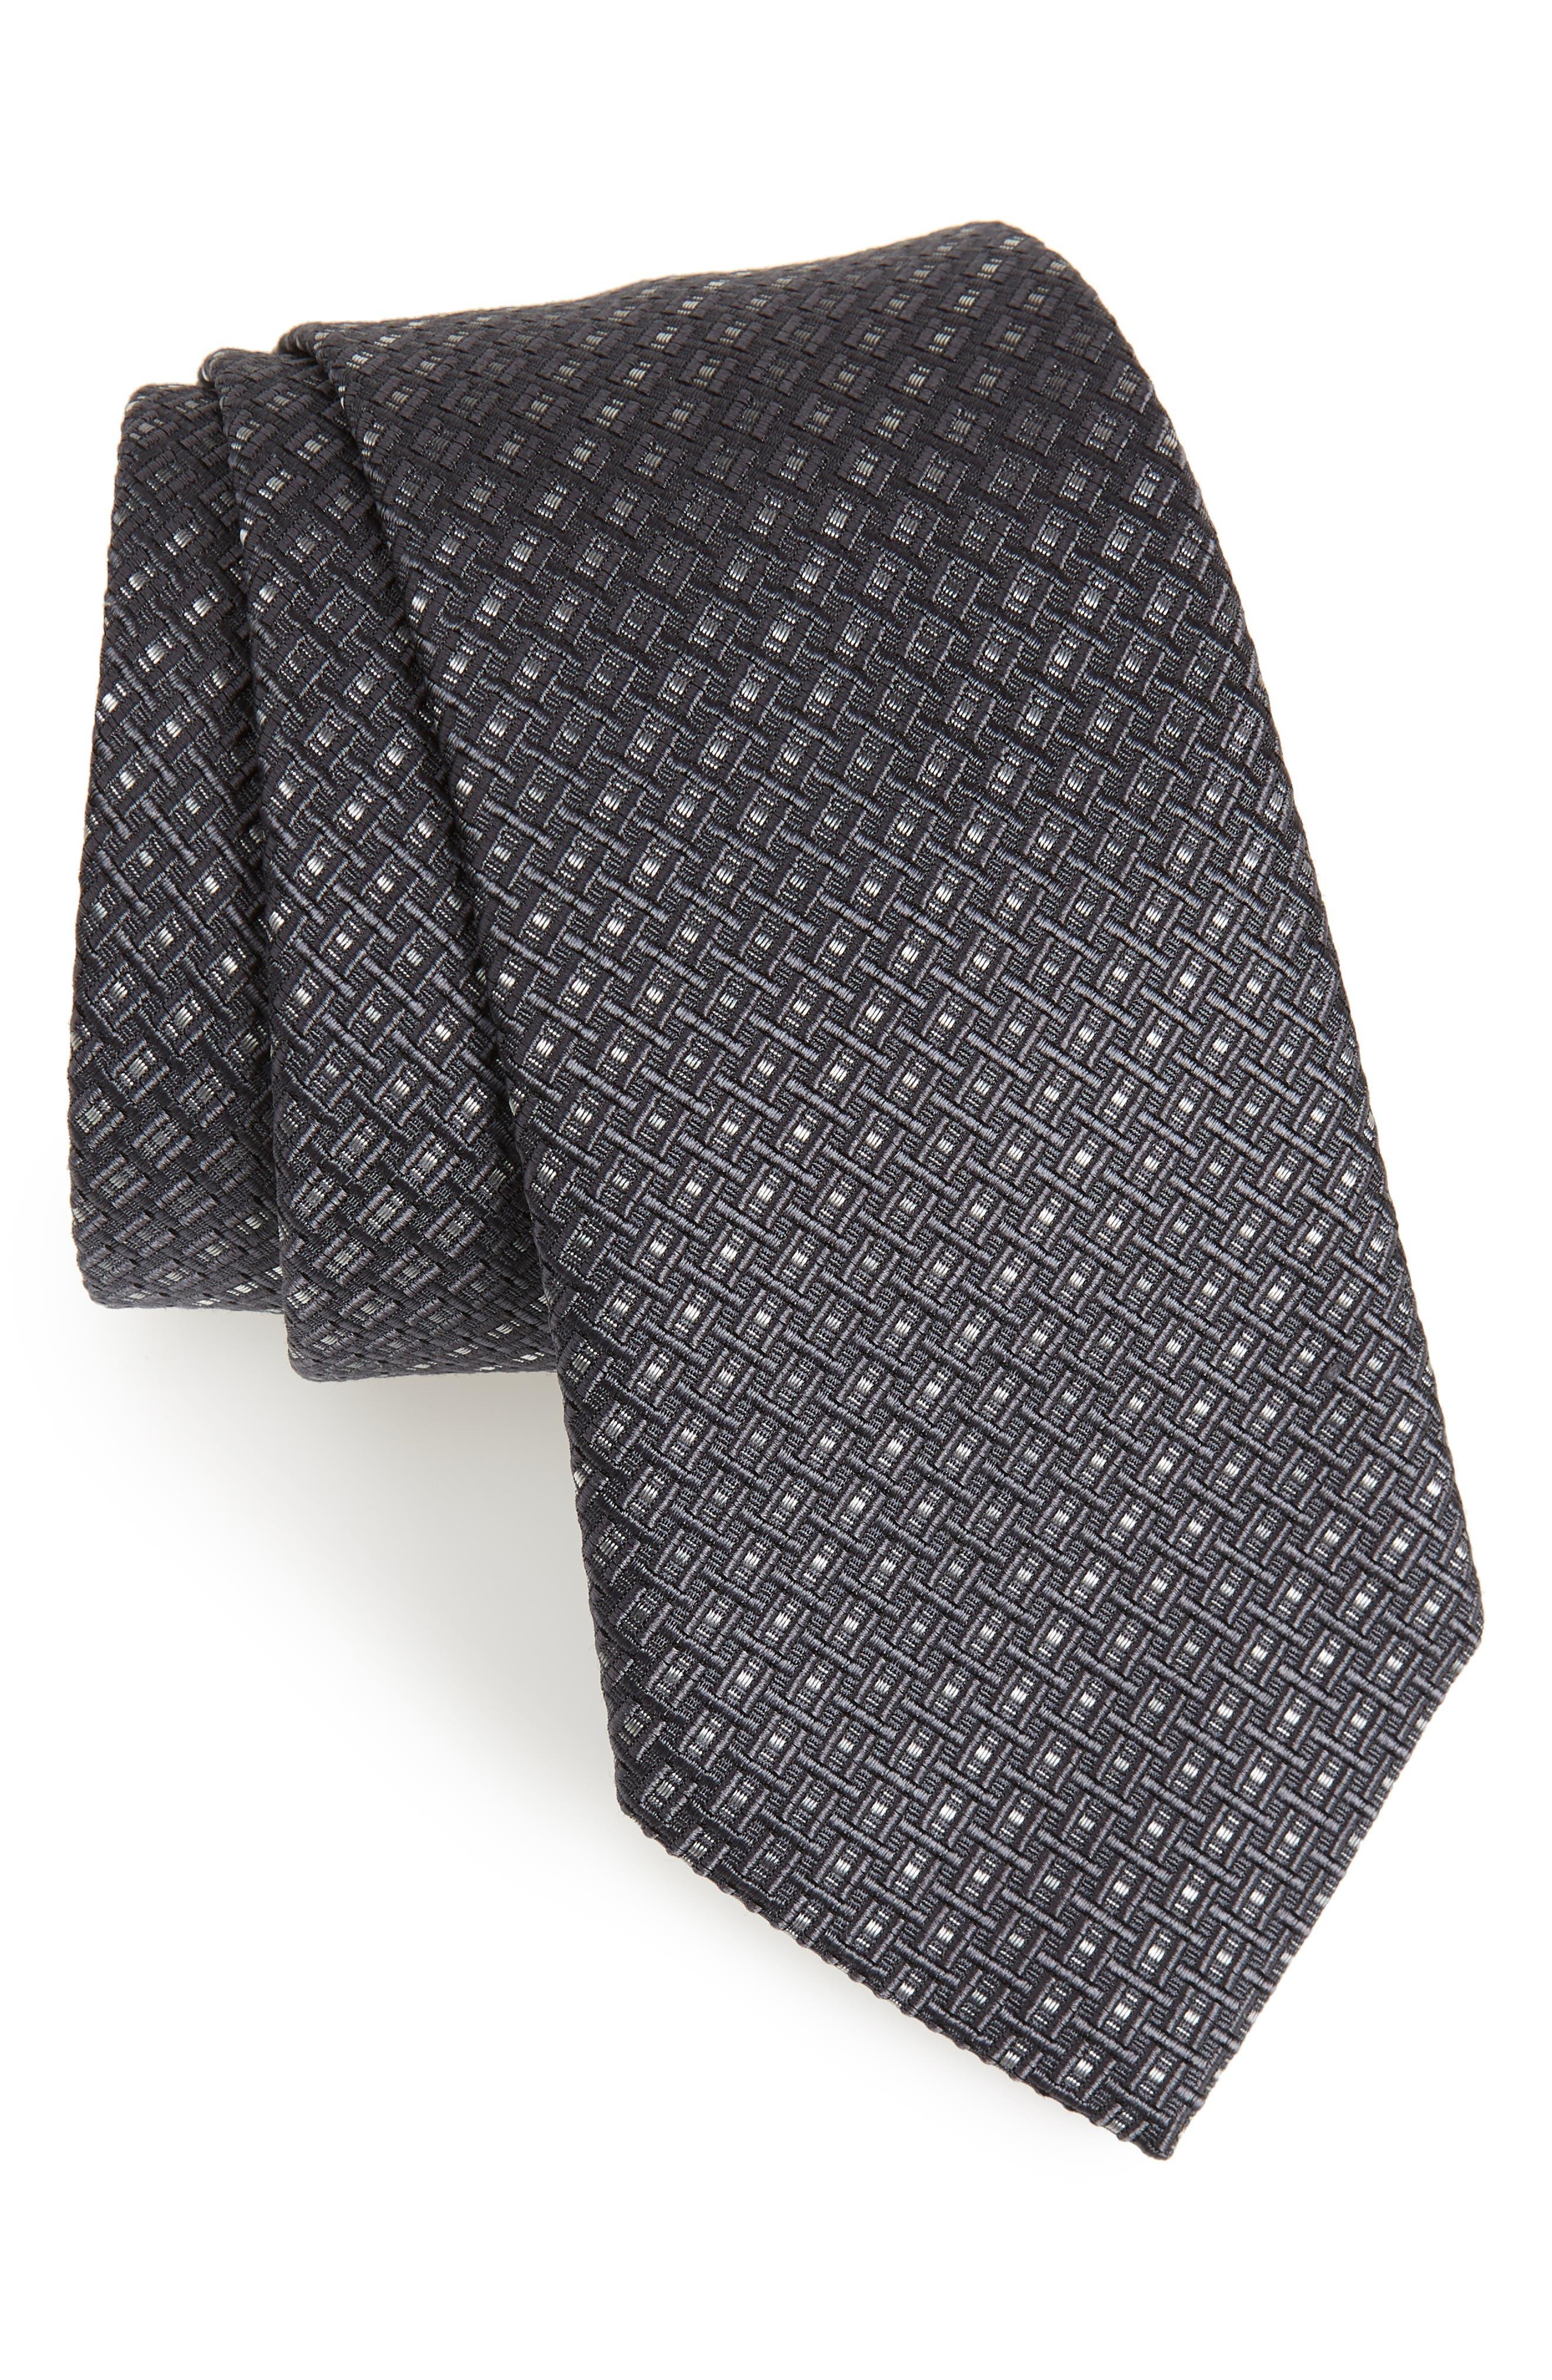 Main Image - Salvatore Ferragamo Este Solid Silk & Cotton Tie